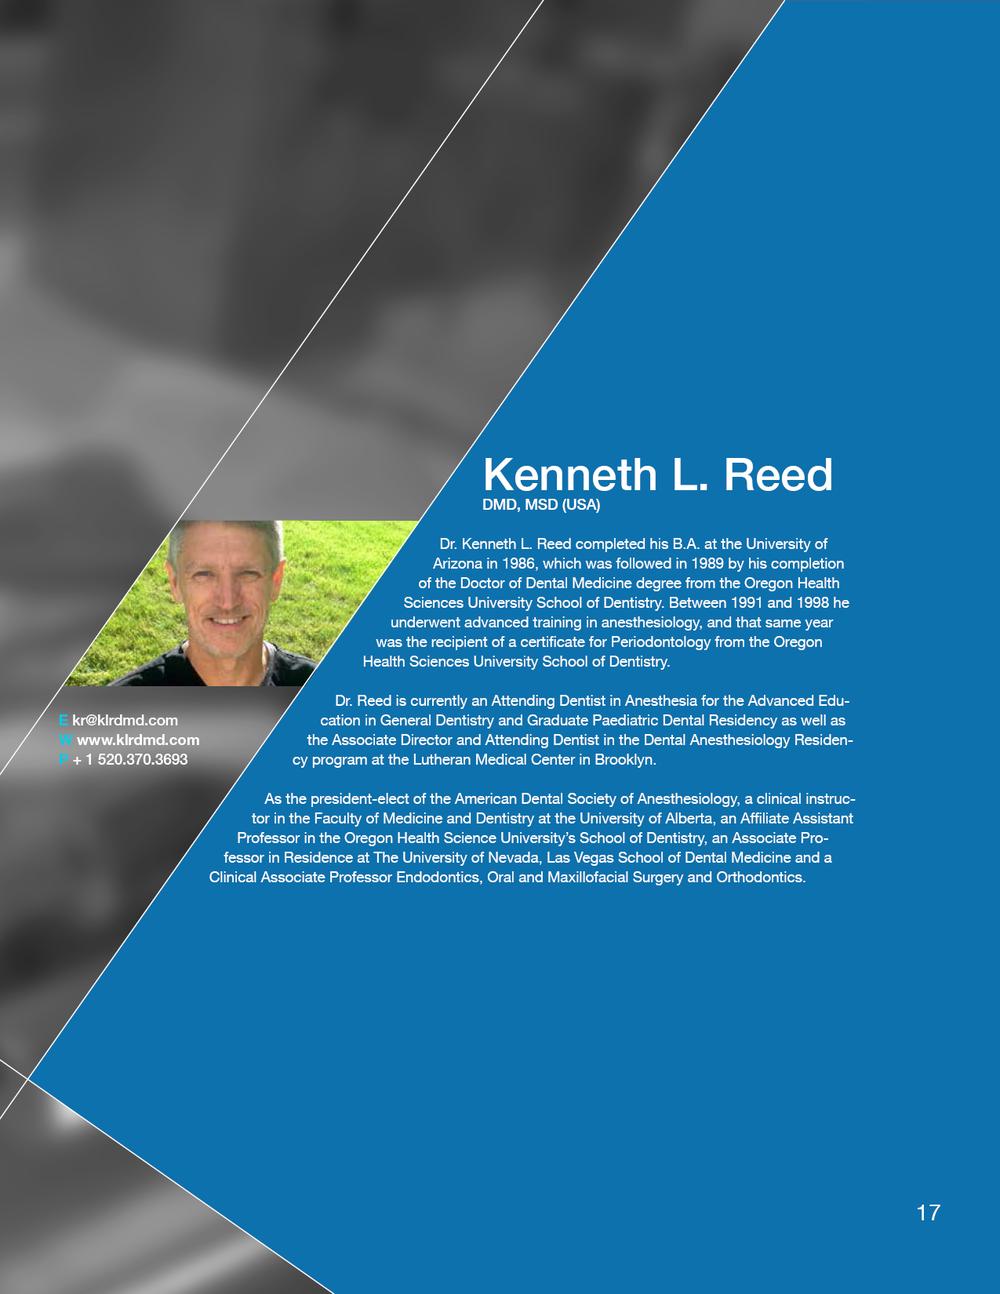 Dental Ed Brochure 2014_1_1517.png